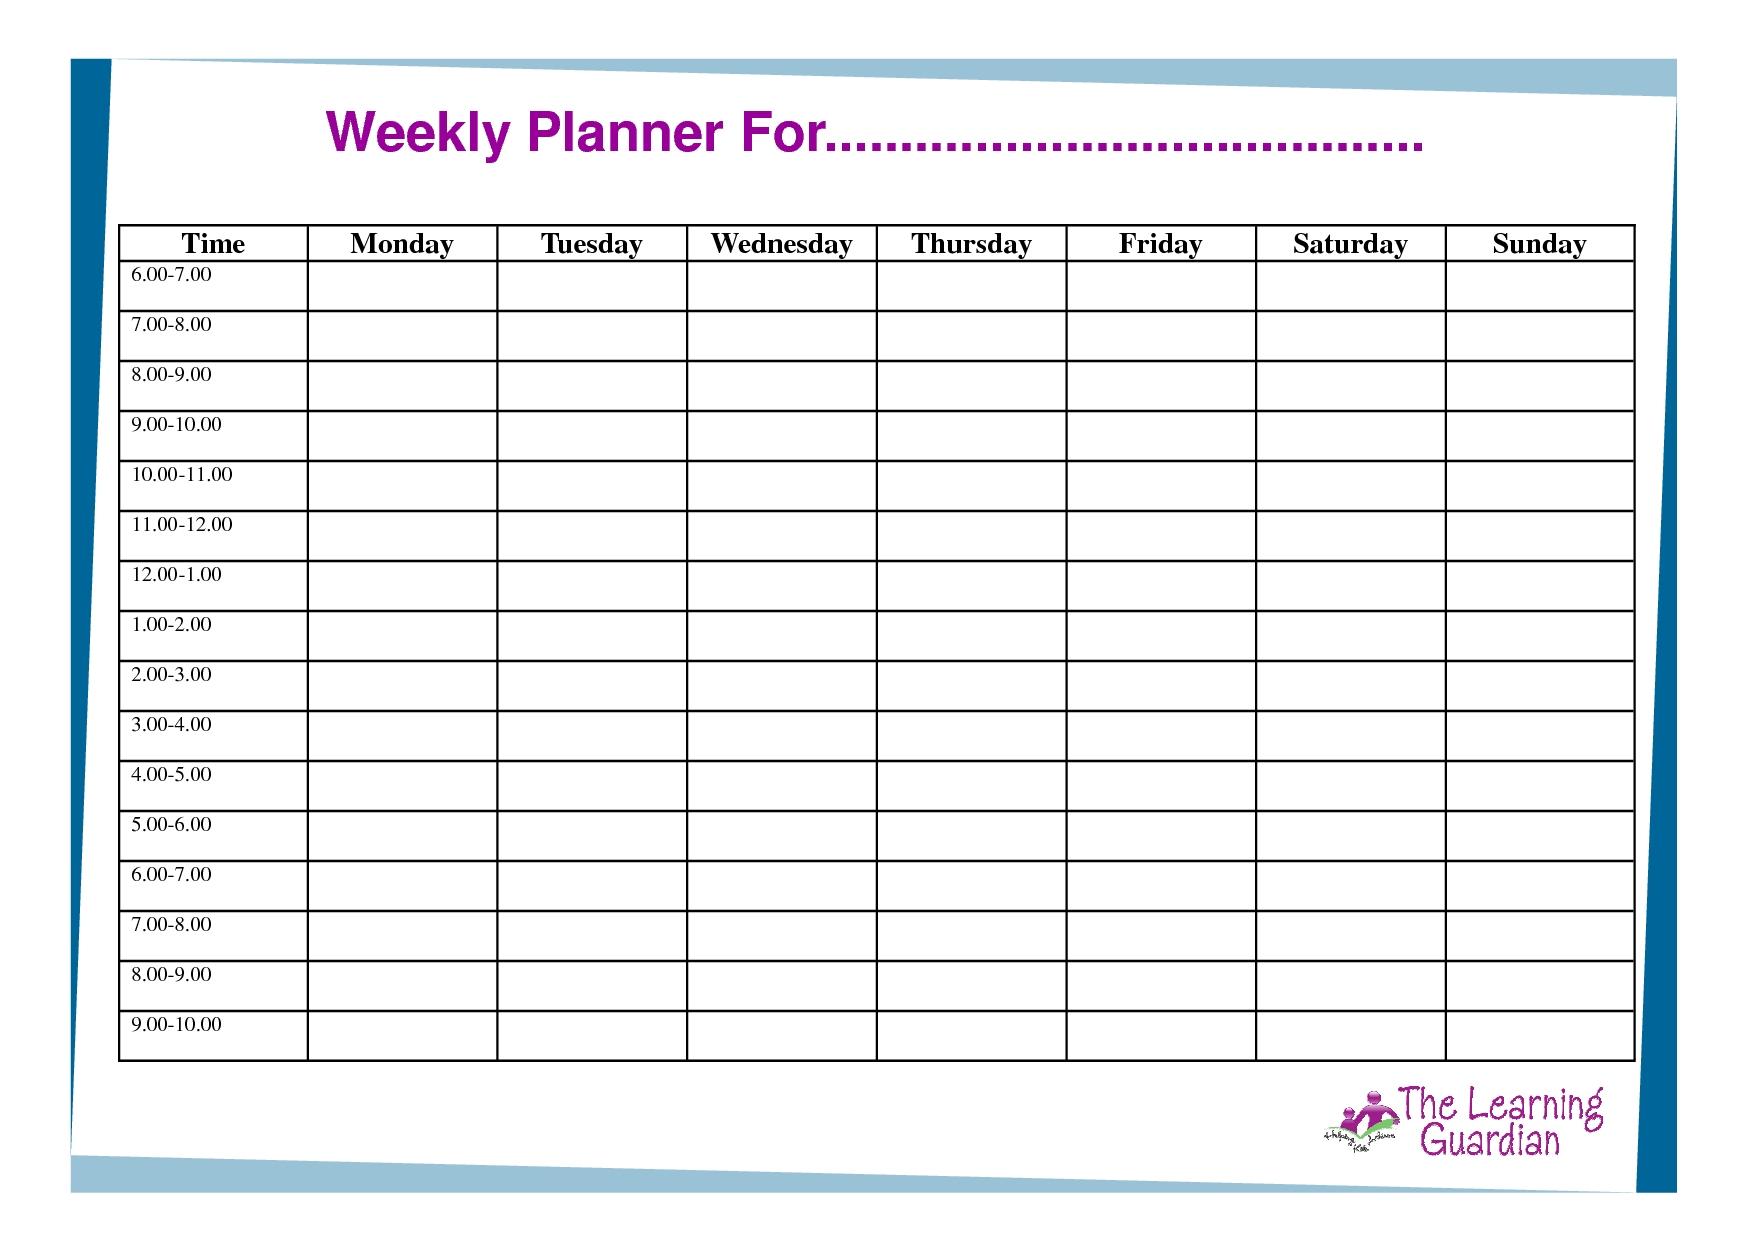 Free+Printable+Weekly+Planner+Templates In 2020 | Weekly